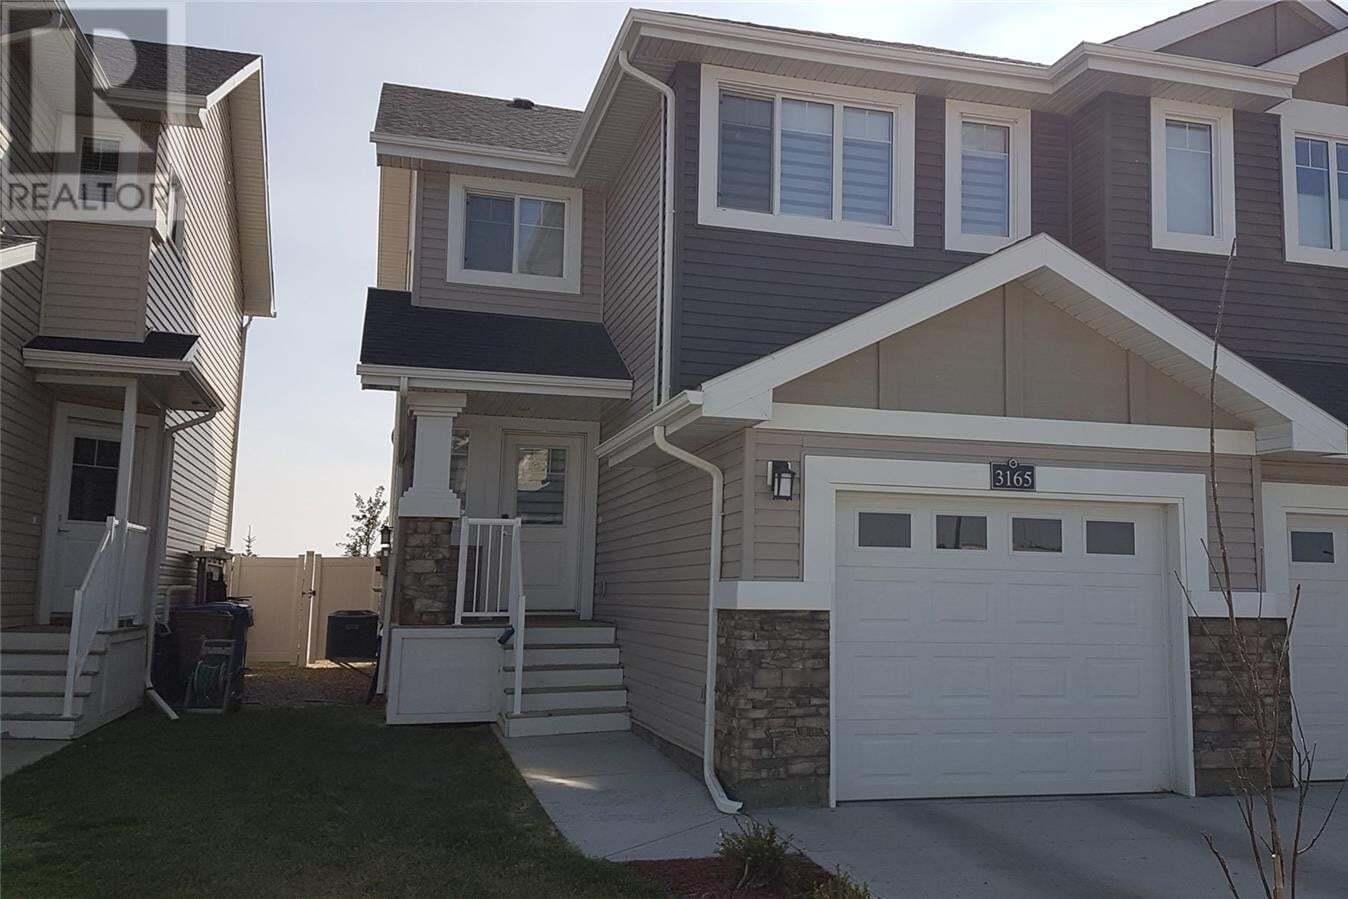 House for sale at 3165 Mazurak Cres Regina Saskatchewan - MLS: SK826185